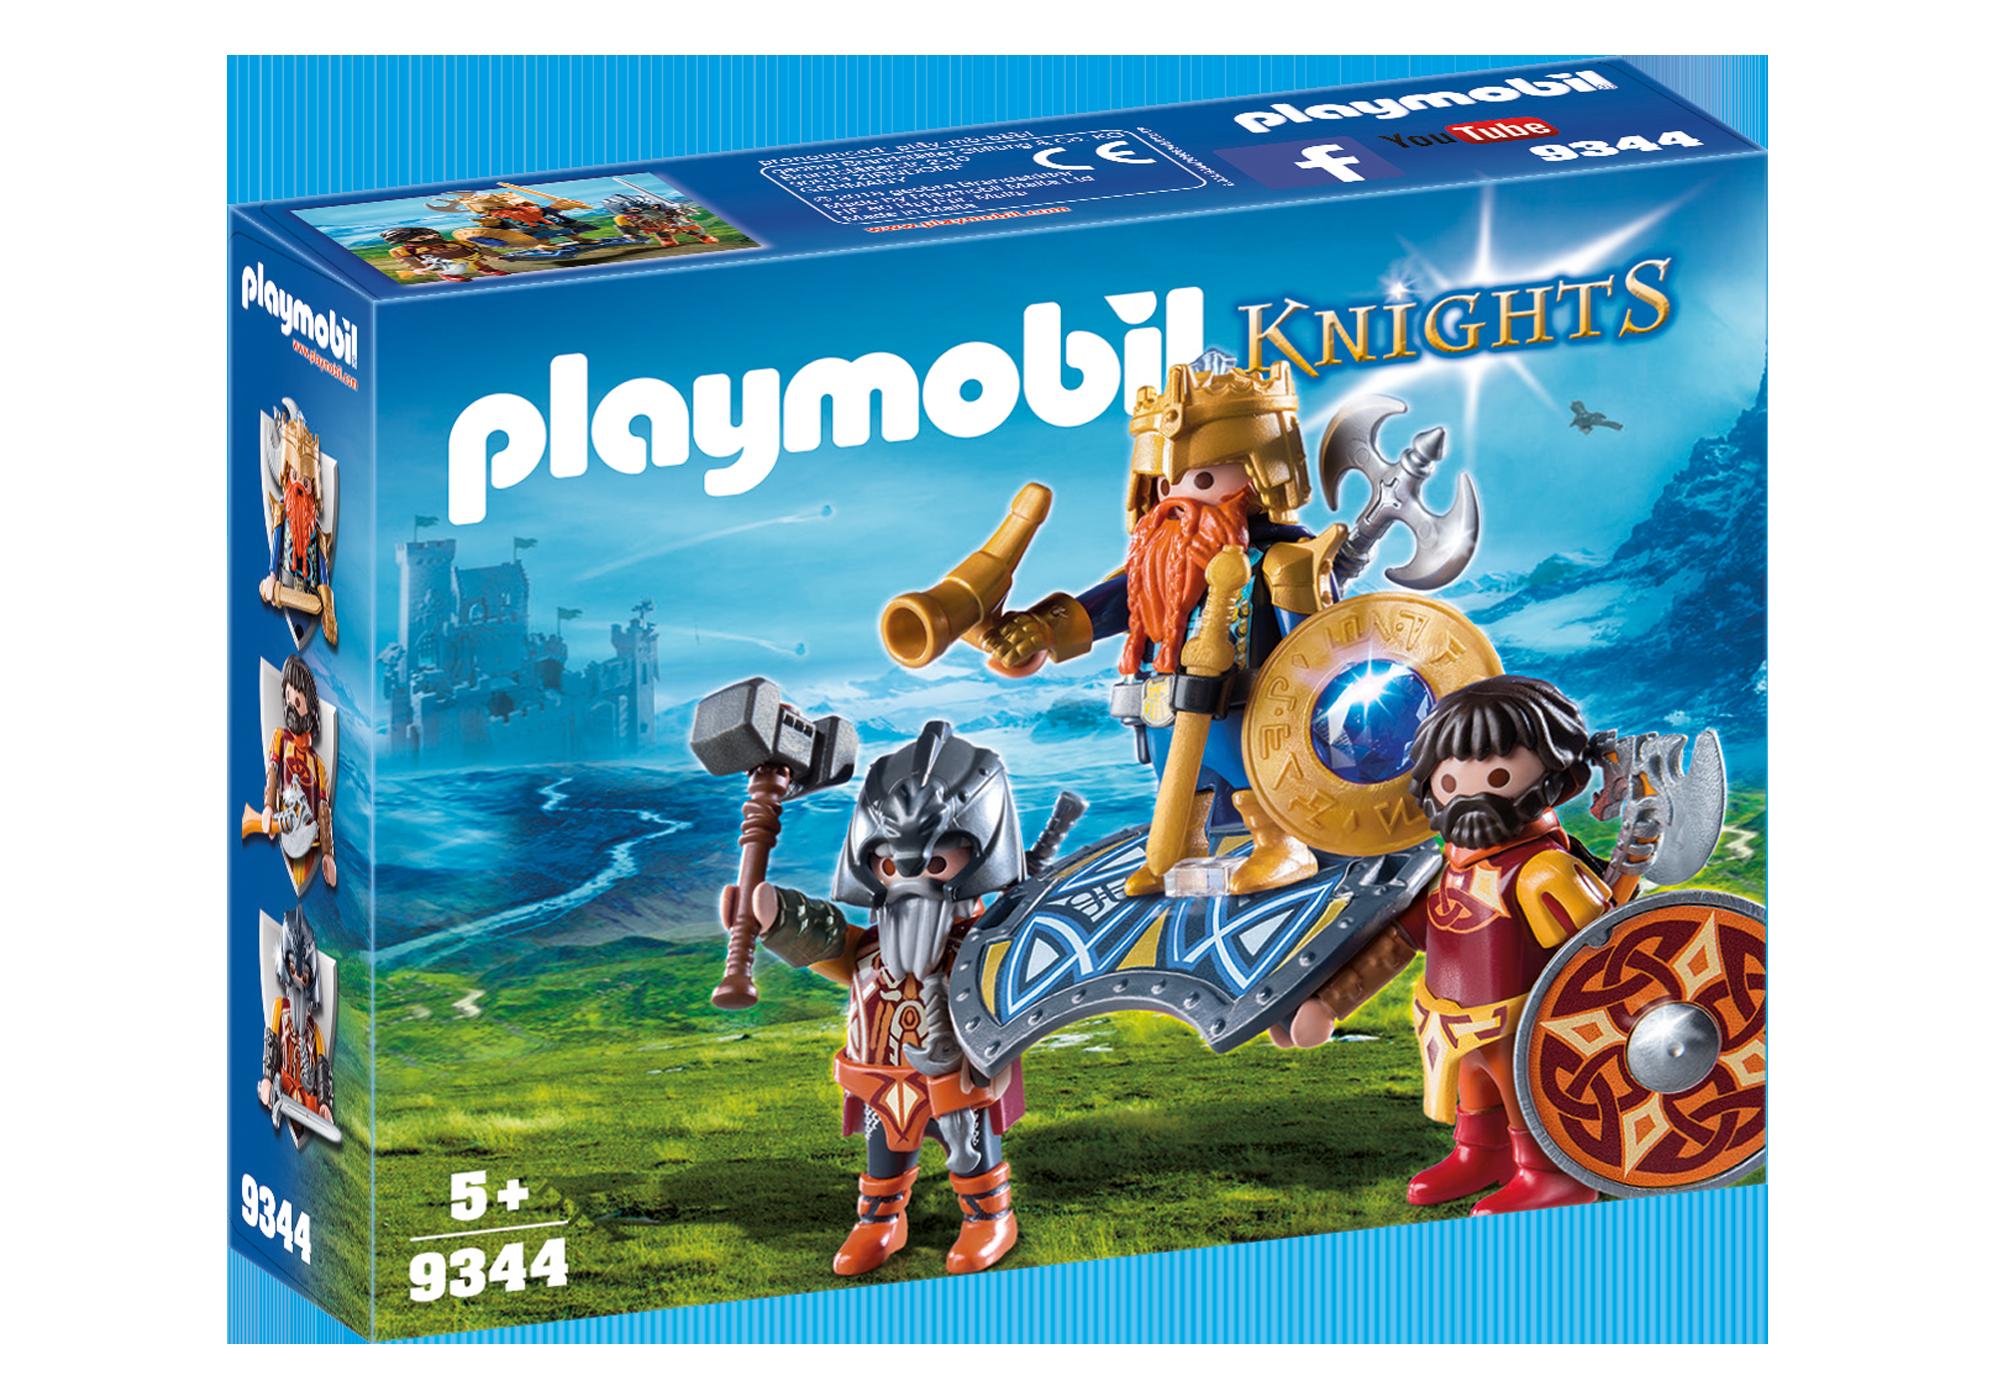 http://media.playmobil.com/i/playmobil/9344_product_box_front/Βασιλιάς των Νάνων με δύο φρουρούς